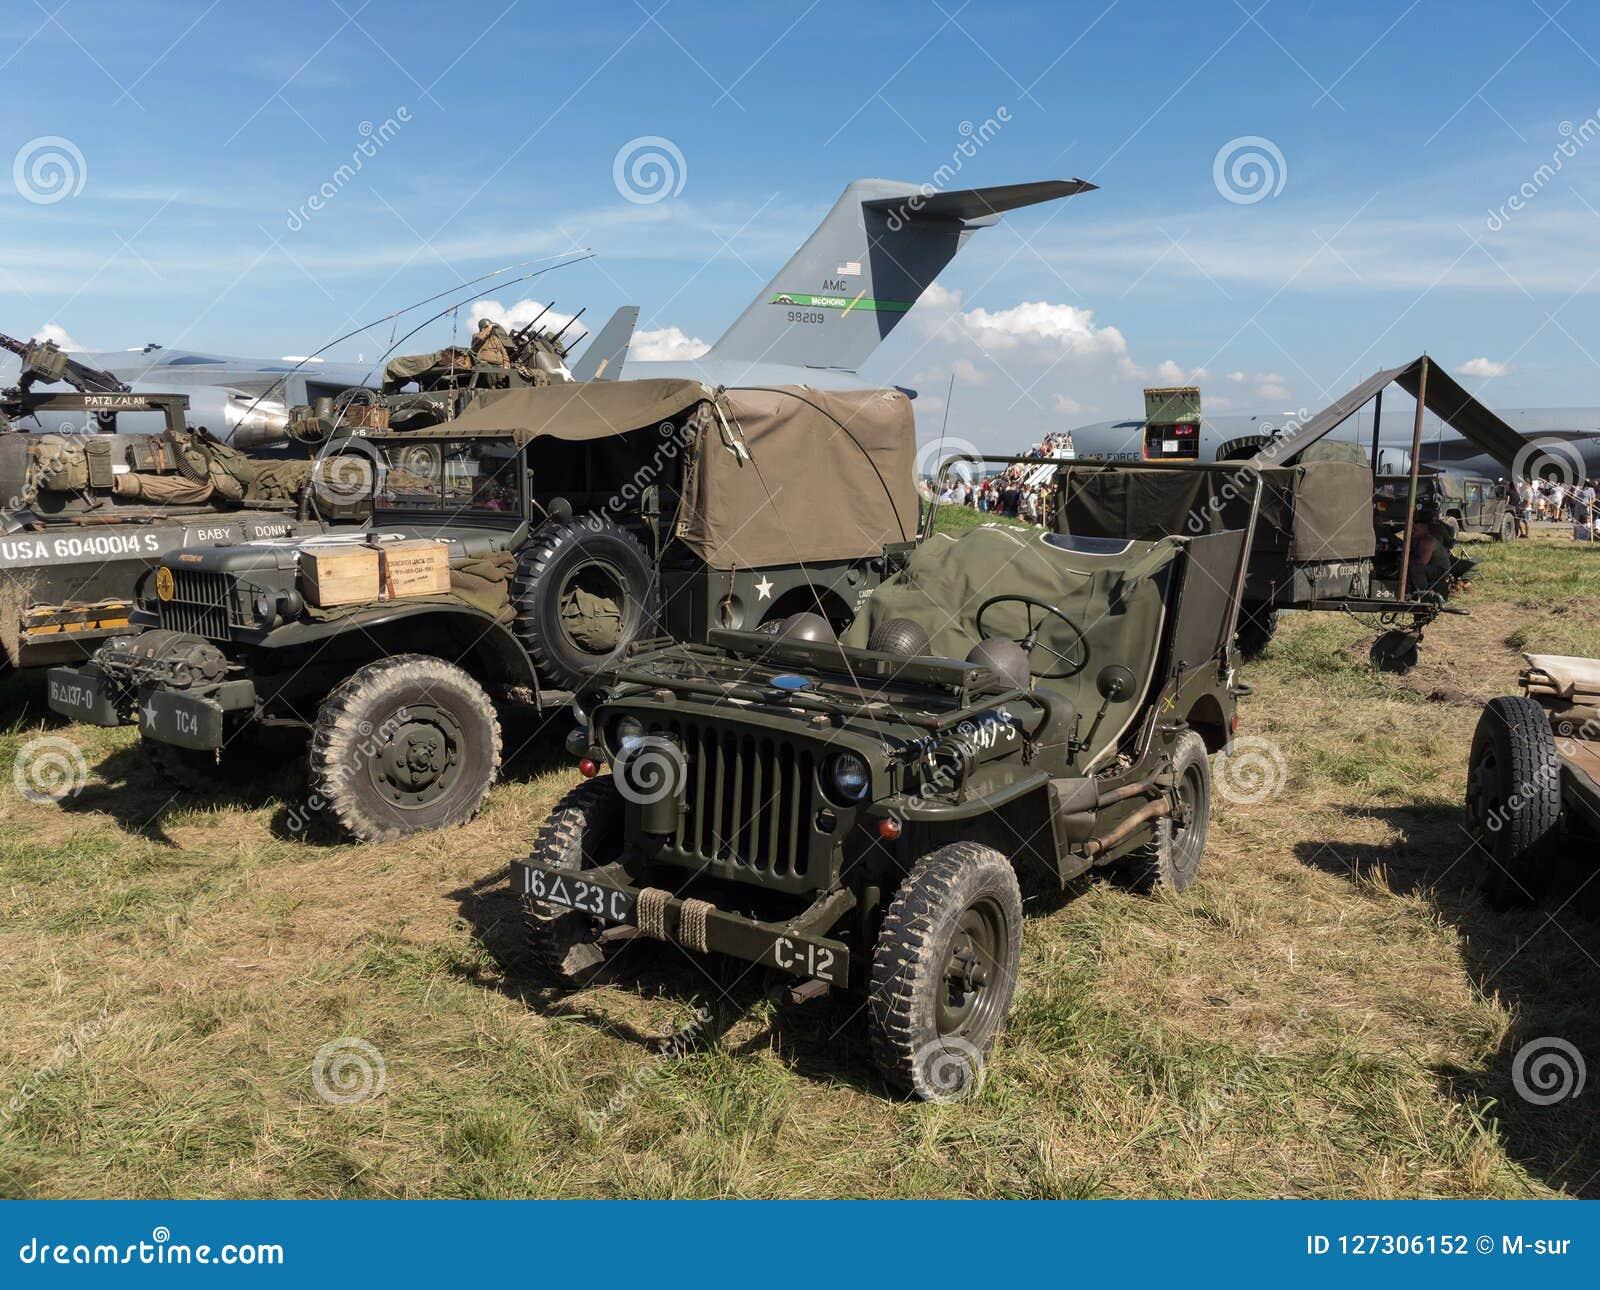 MB di Jeep Willys ed altri veicoli militari storici